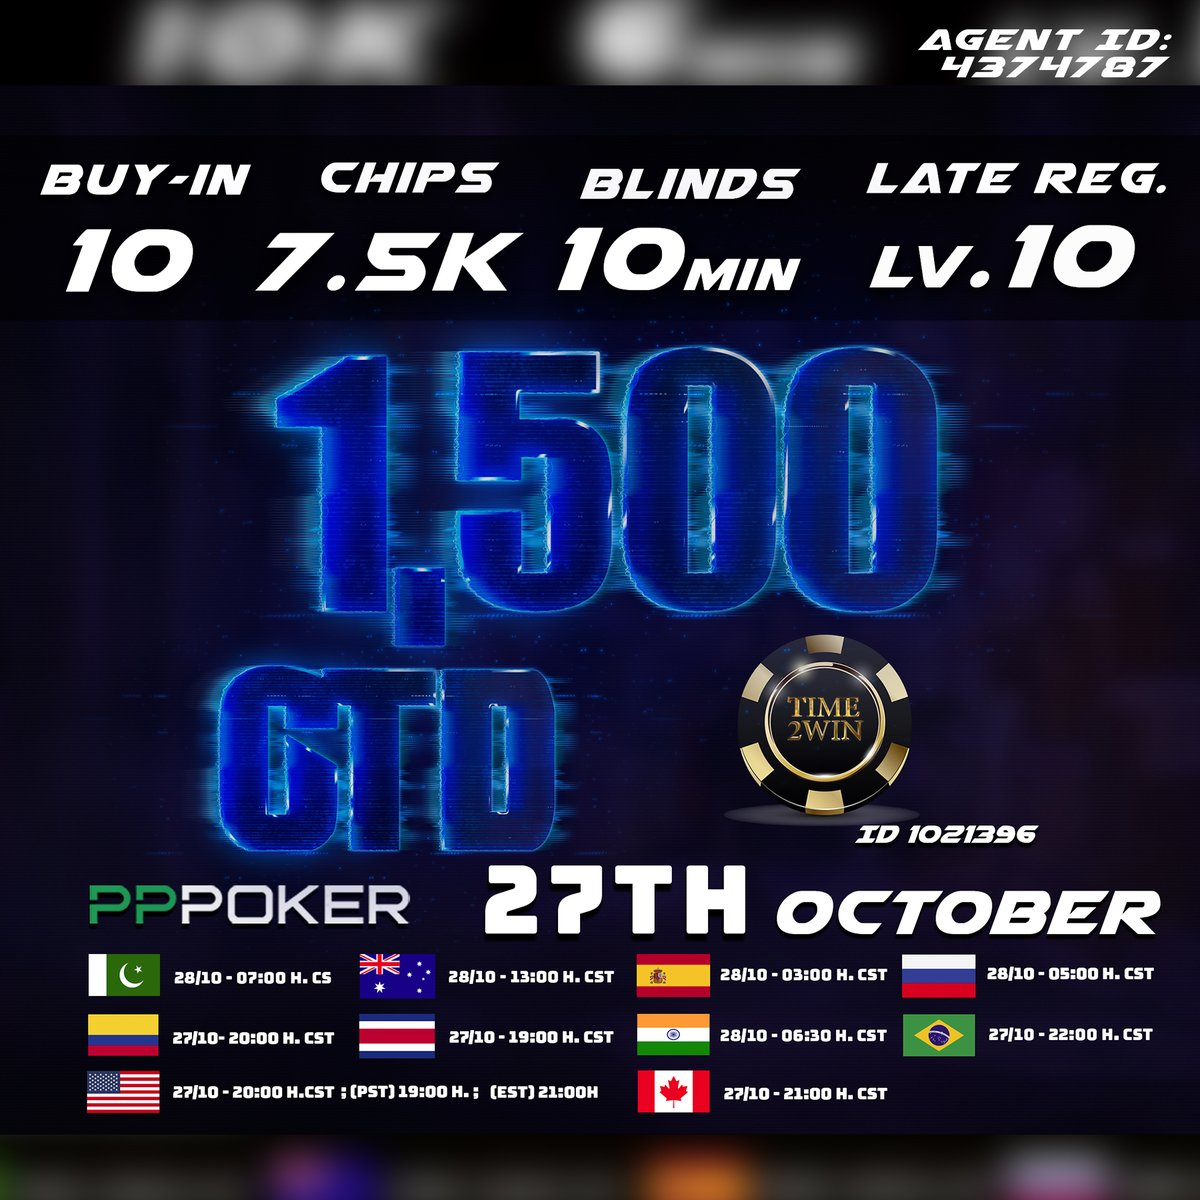 ♠♥♣♦https://t.co/4B2vbEvKrw♠♥♣♦ 👉🏻Time2win (ID 1021396) 👉🏻RAKEBACK 30% 💸➕¡BONO DE DEPOSITO HASTA 15%! 👉🏻Agent ID 4374787  📢1,500 USD GTD 🔥 Buy-in:10💸 Start.Chips: 7.500 Late reg. up to level 10  #pppoker #easypppoker #pokerface  #pokeronline #poker #Pokerchips https://t.co/qsiLlIZQjJ